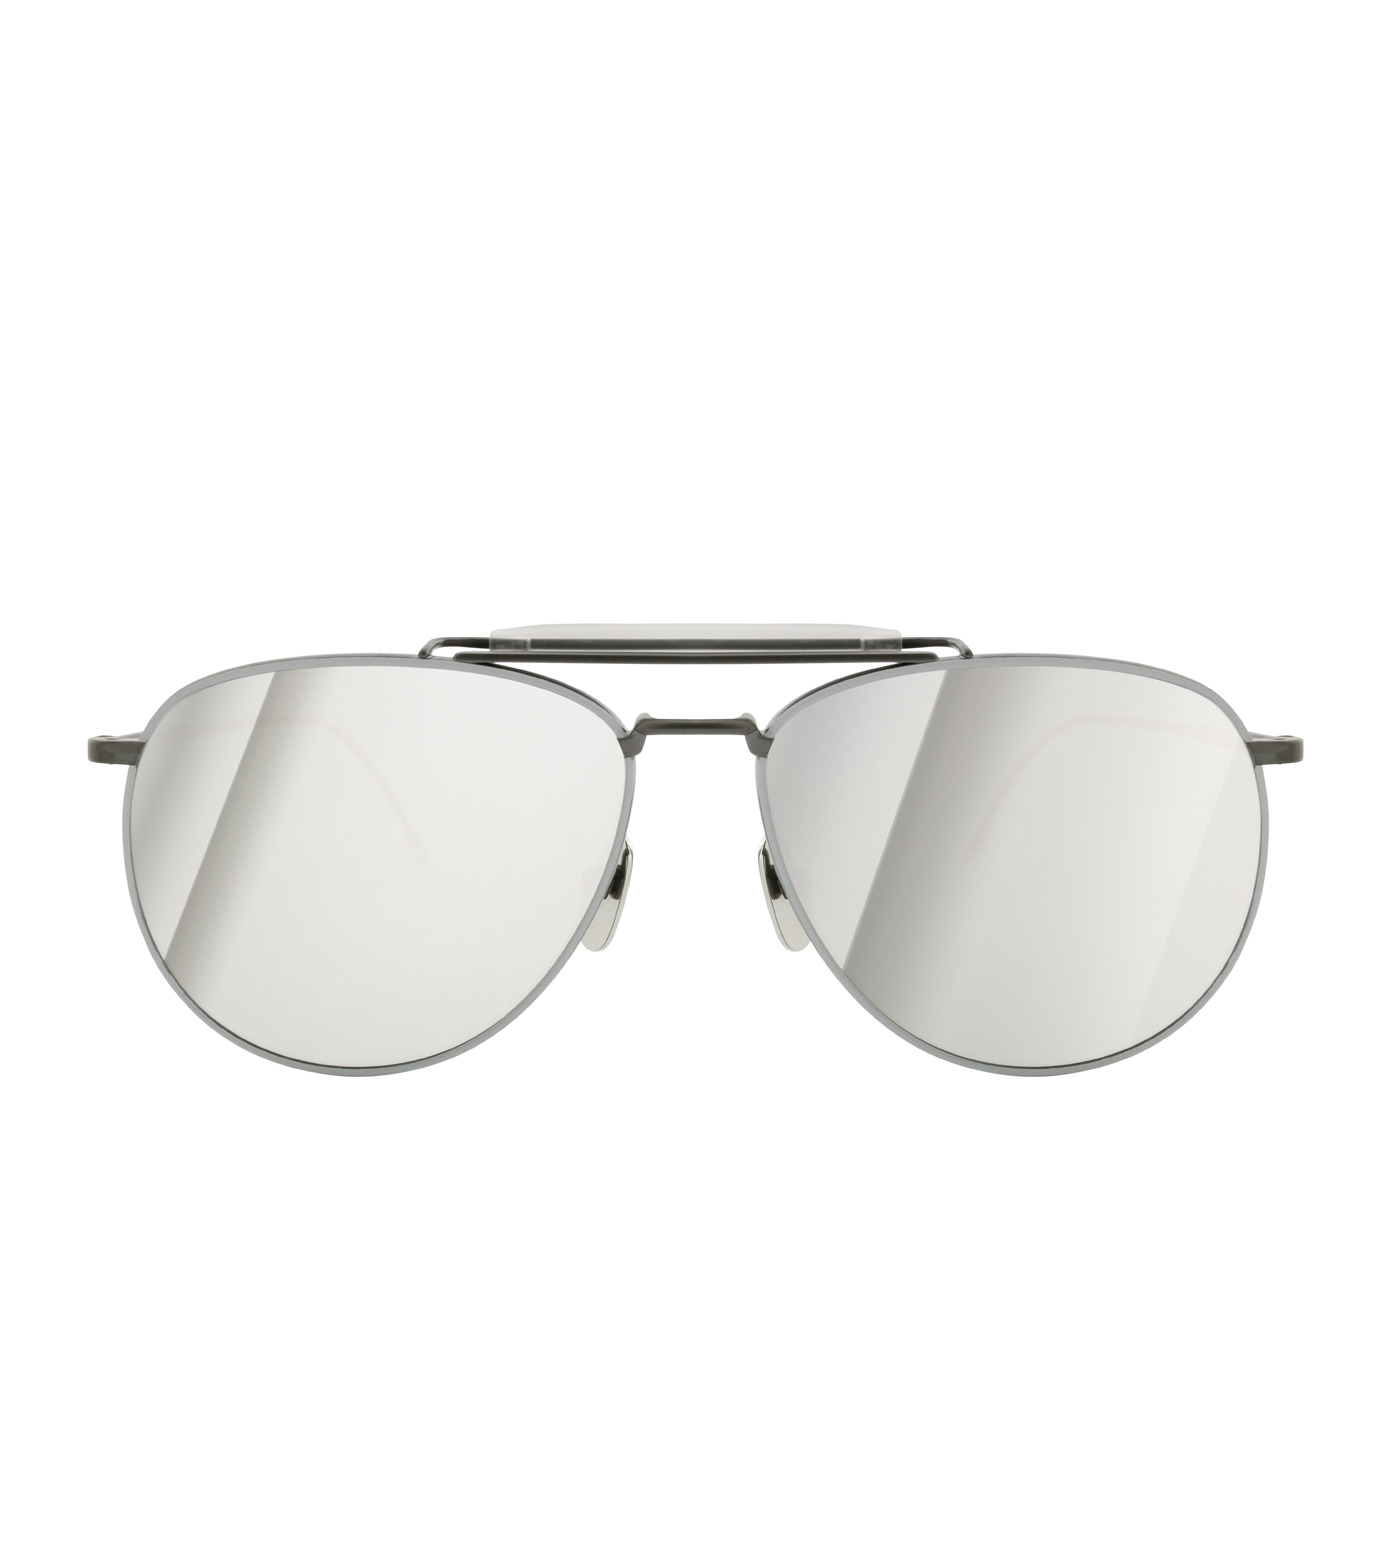 Thom Browne Eye Wear(トム・ブラウン・アイウェア)のTeardrop Silver-BLACK(アイウェア/eyewear)-TB-015-LTD-13 拡大詳細画像3